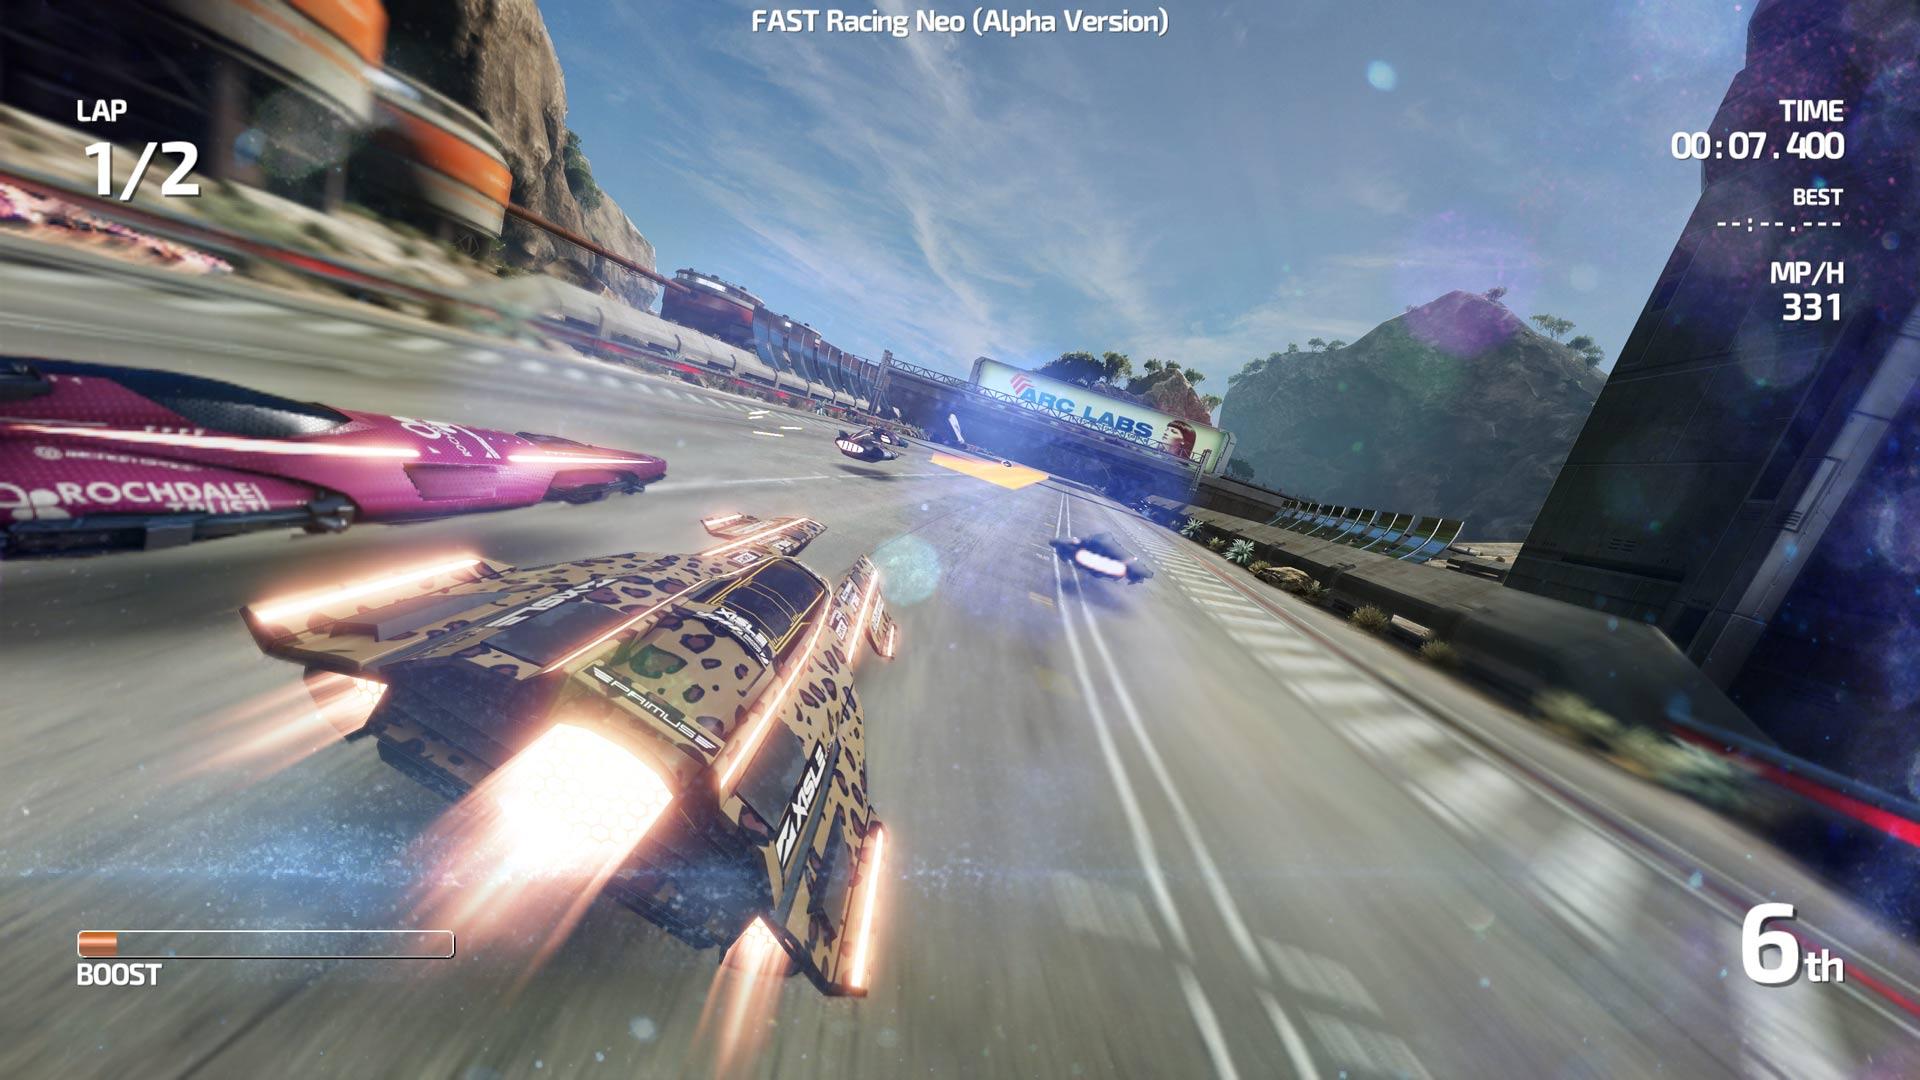 9 - FAST Racing Neo.jpg